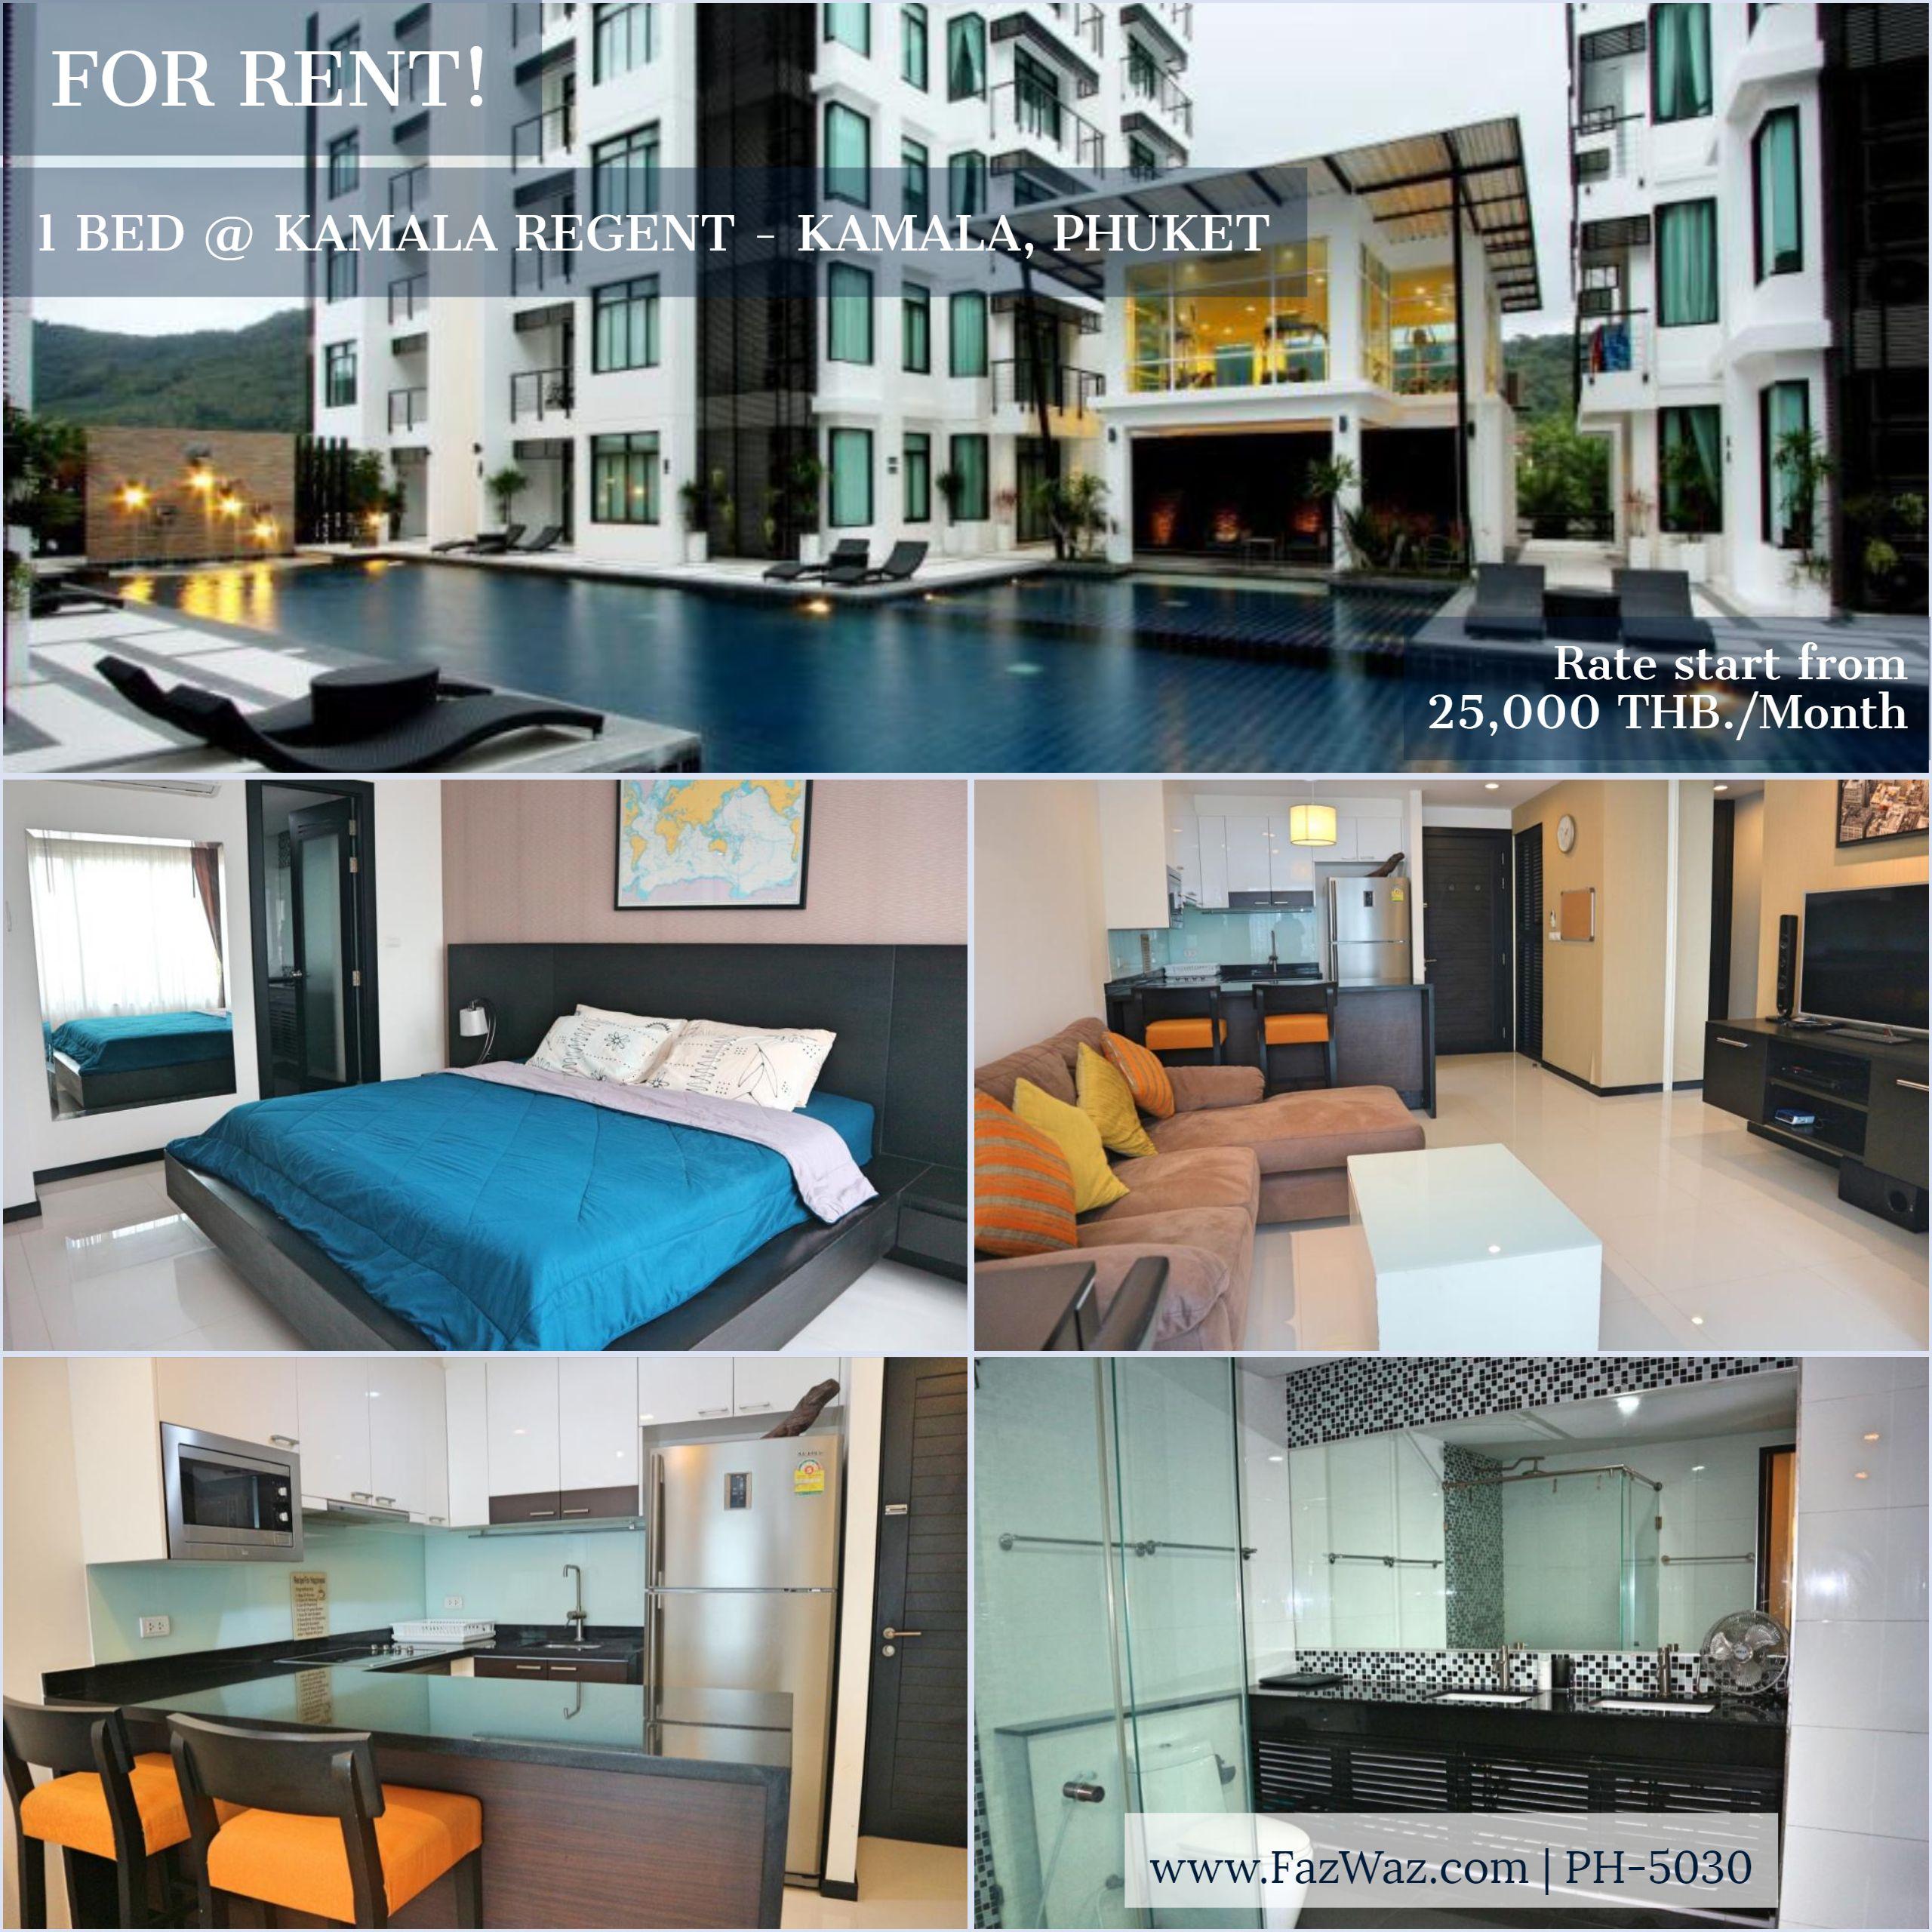 1 Bedroom Modern Apartment For Rent Modernapartment Apartmentforrent Phuket Thailand Lofts For Rent Condos For Rent Loft Style Apartments